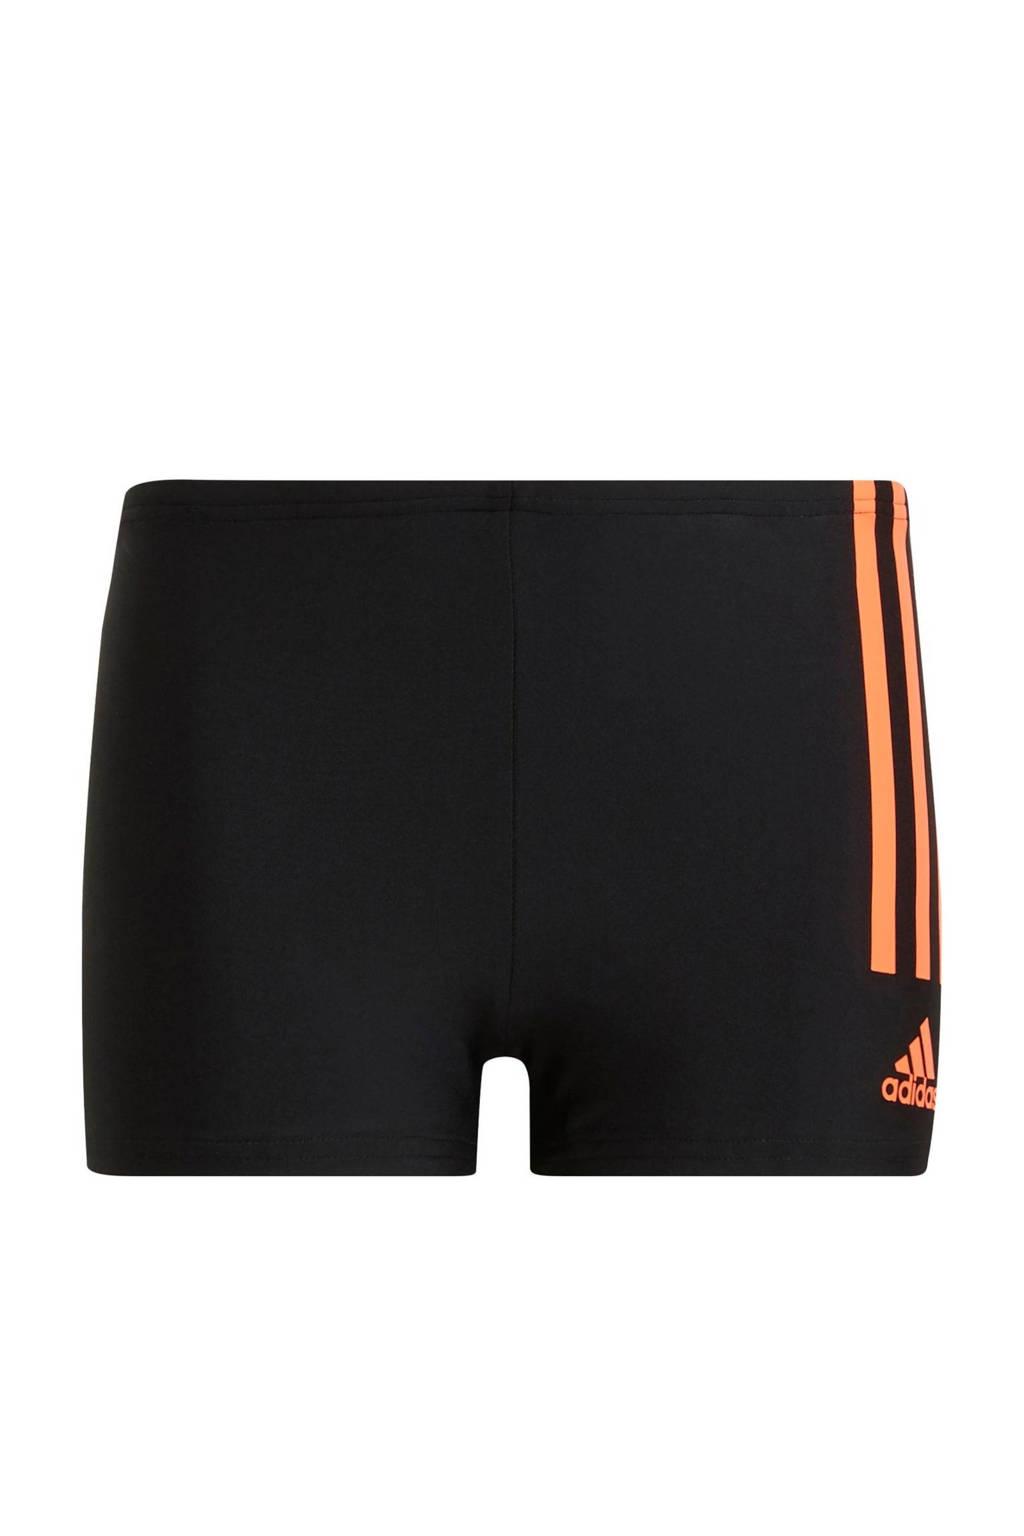 adidas Performance zwemboxer zwart/rood, Zwart/rood